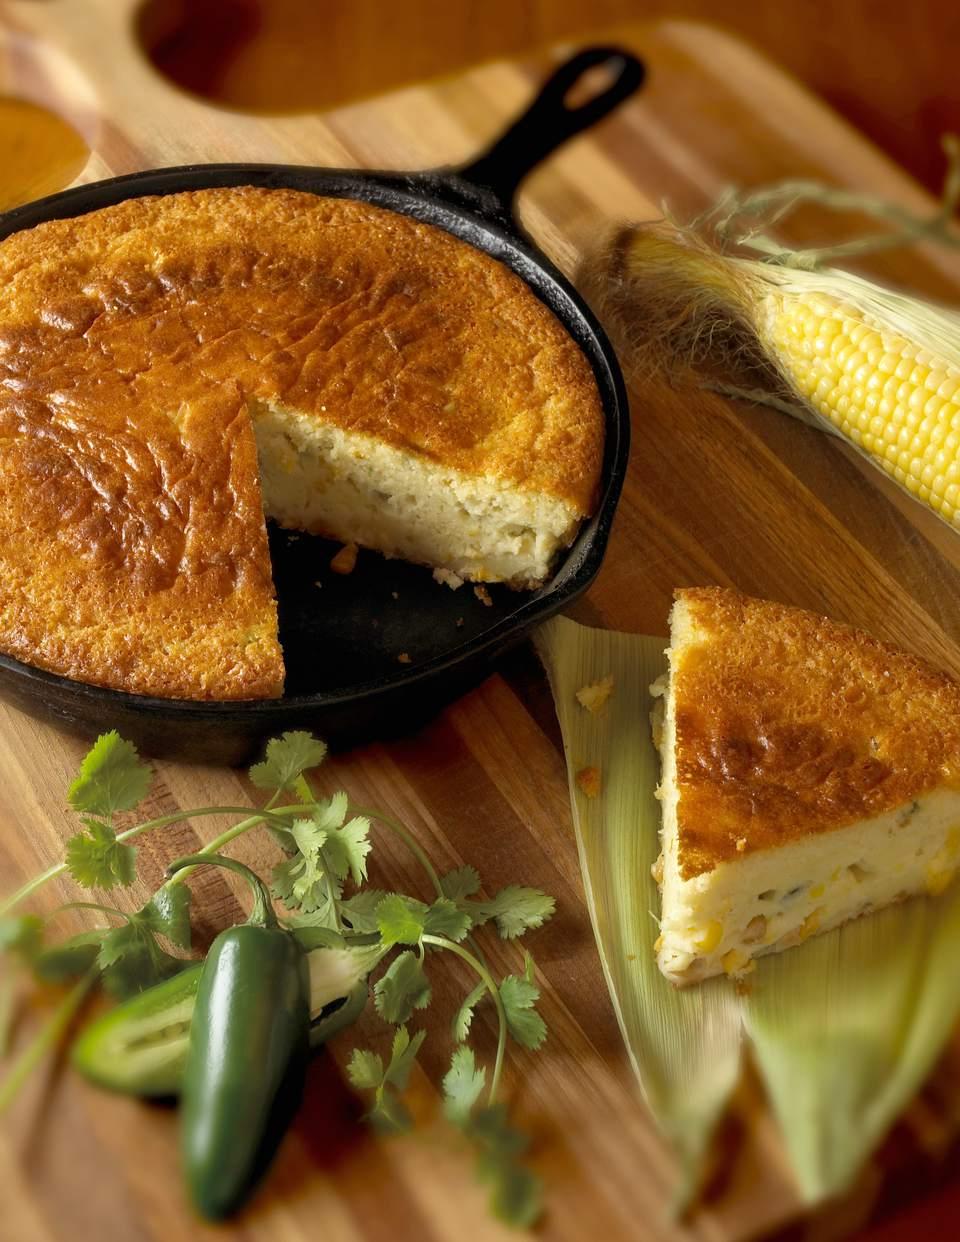 Skillet jalapeno with cornbread